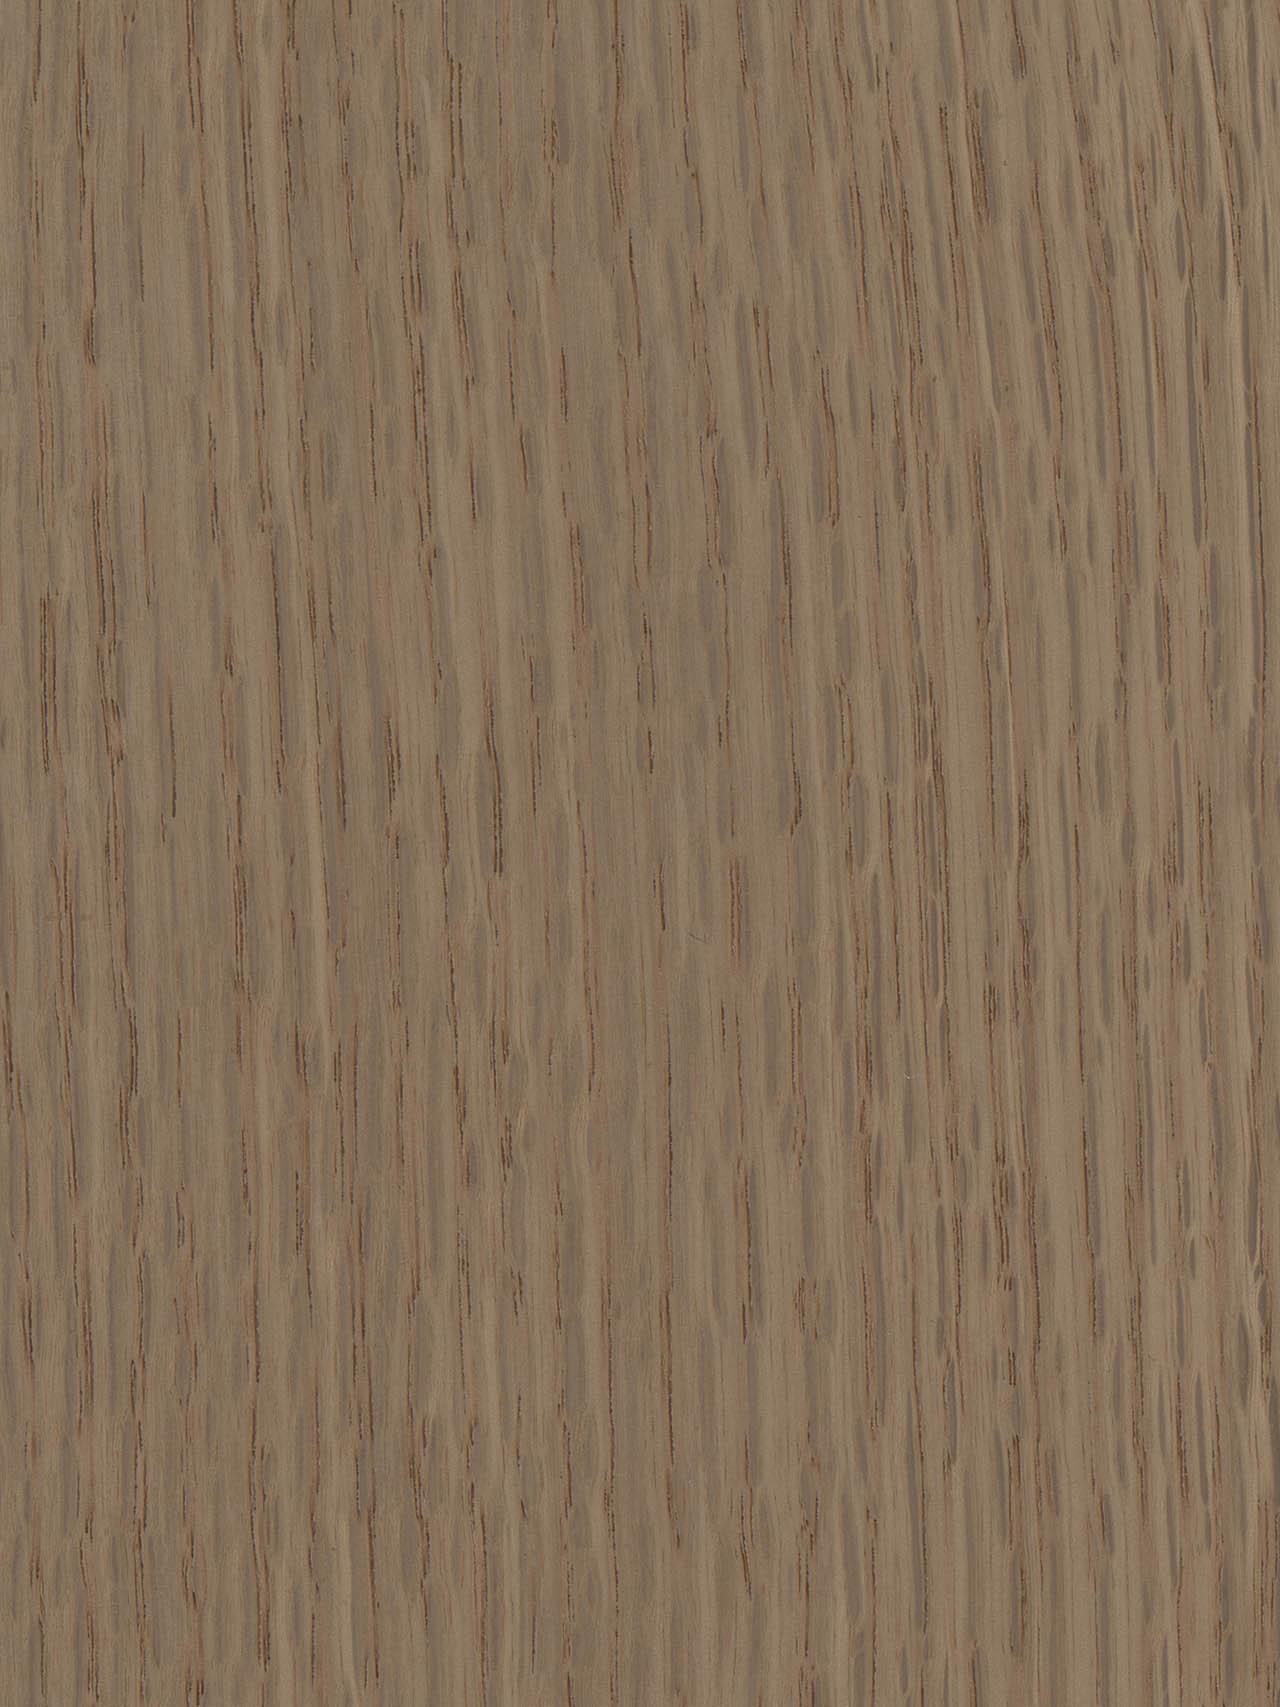 Chapa de madera Roble Avellana MBF138